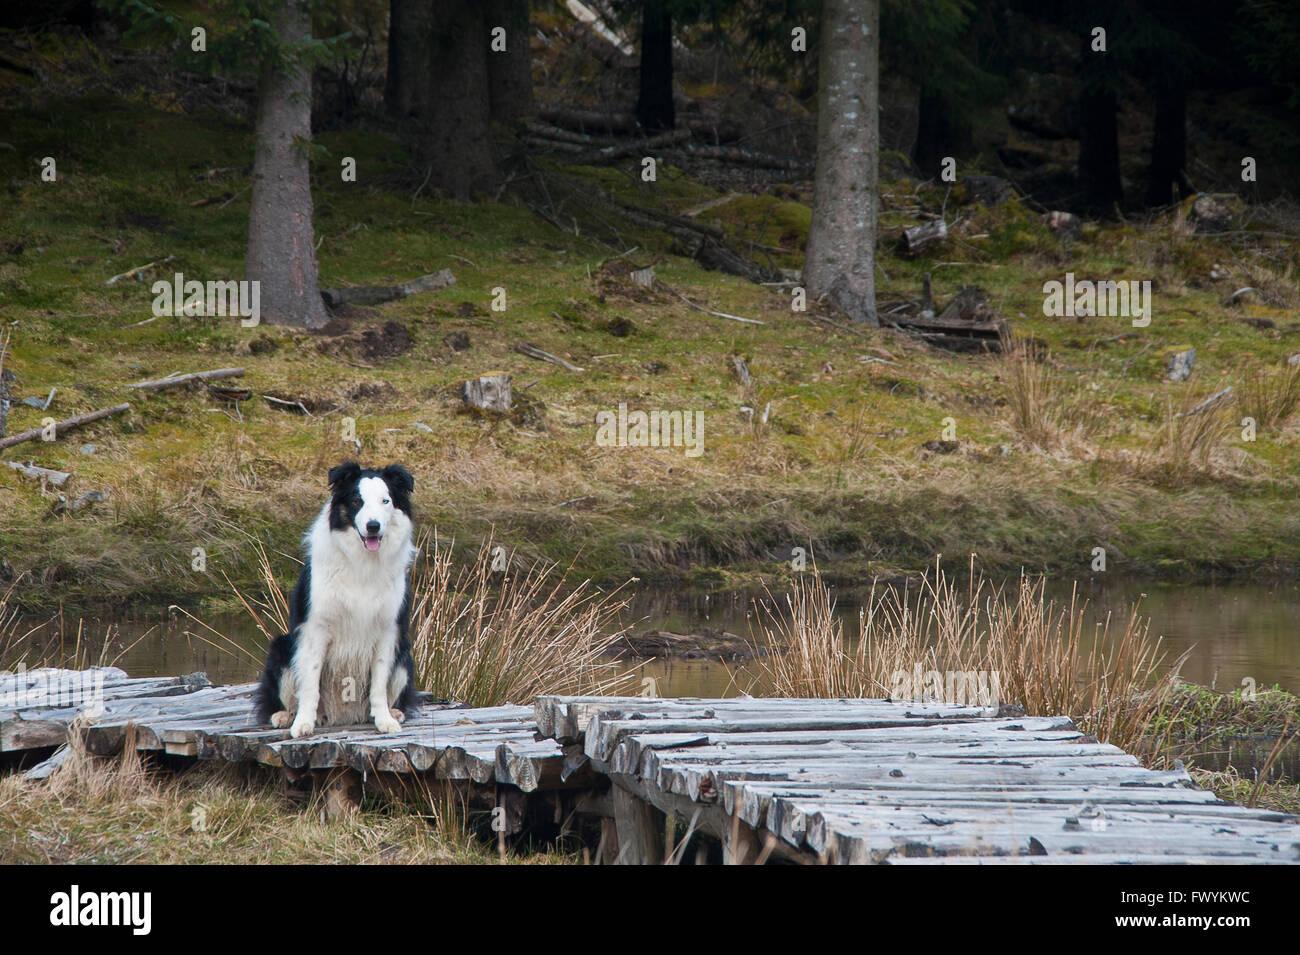 Boardwalk, forest, stream, burn, gill, woodland, clear felling, timber,dog, pine,  conifer, wood, wetland, flooded, - Stock Image